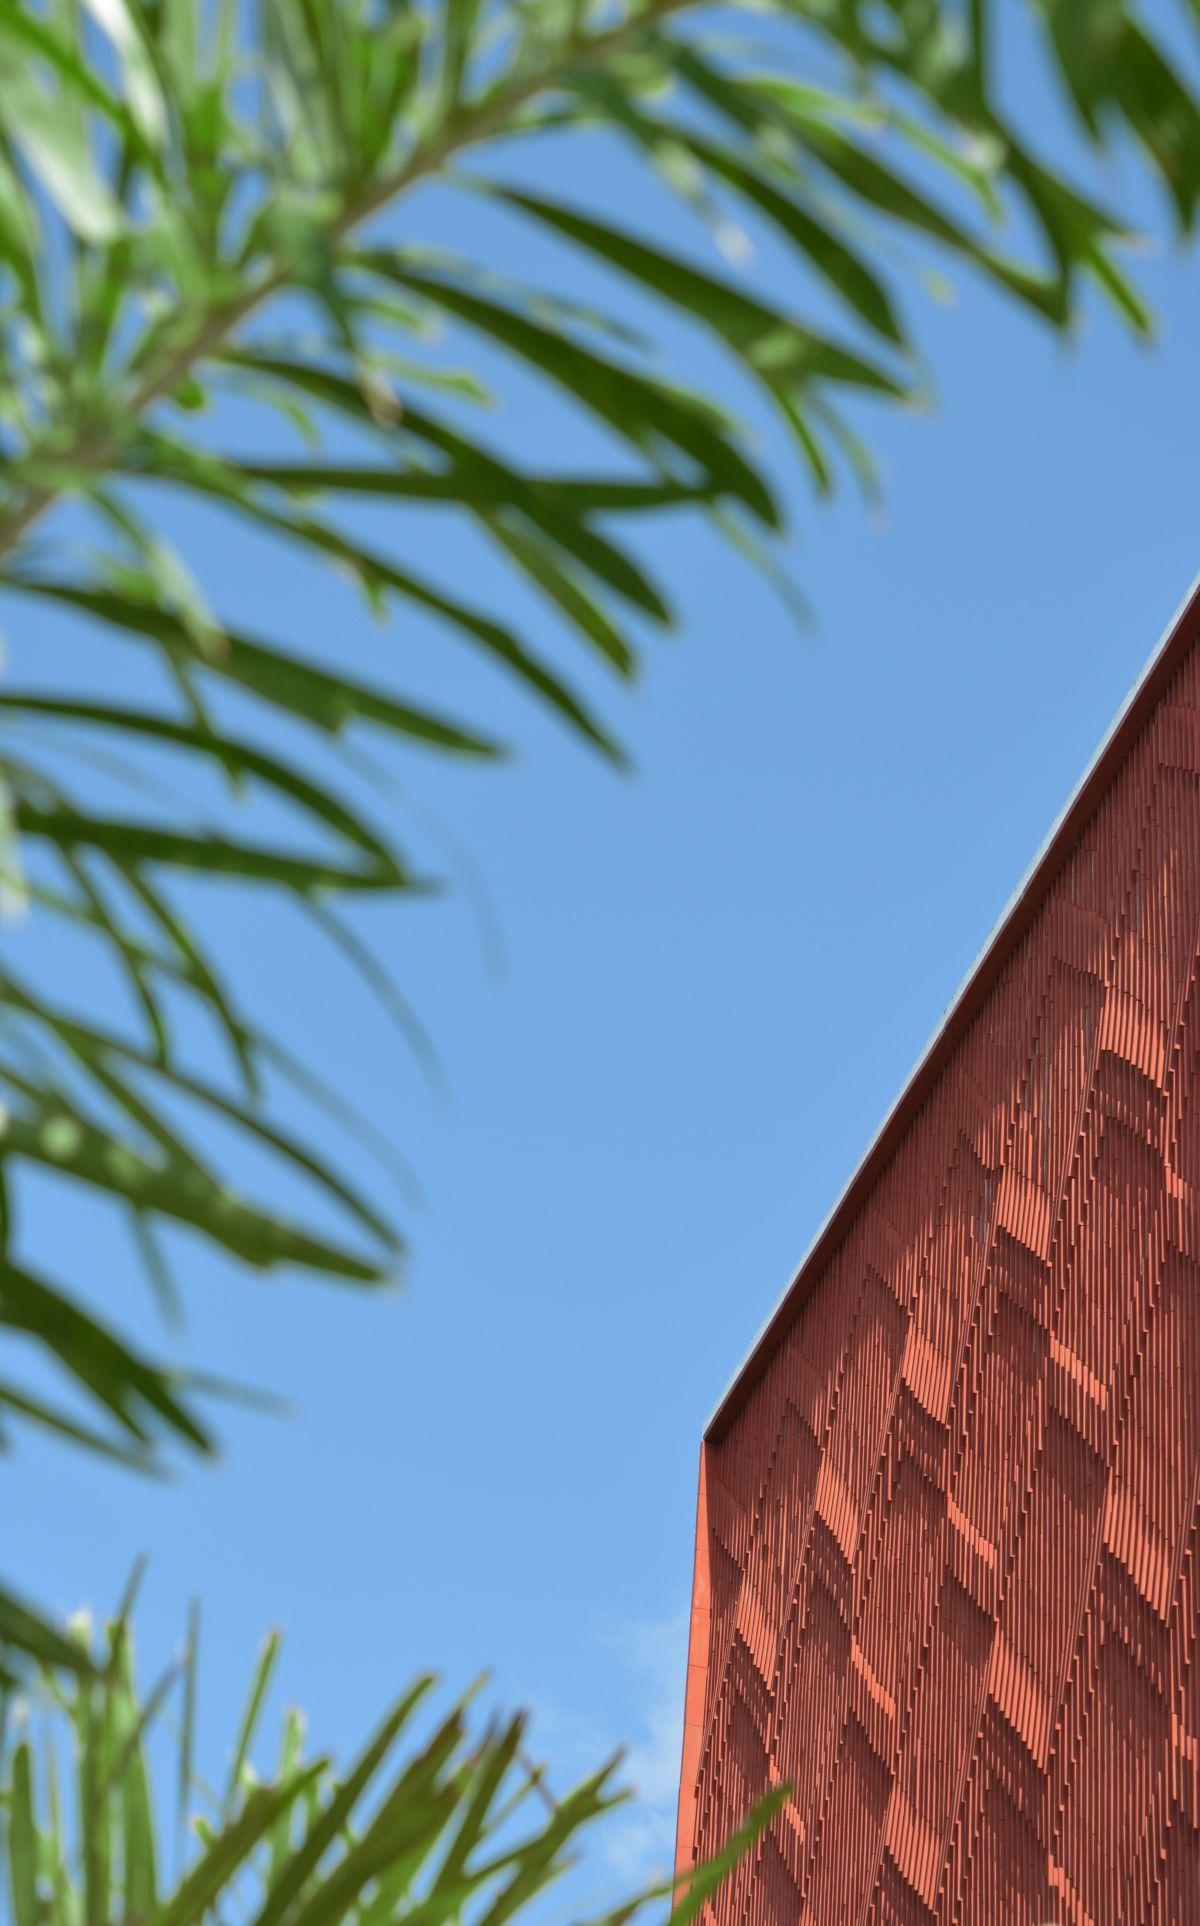 Clay roof tiles façade to minimize heat gain and has decorative function, at Vadodara, by Manoj Patel Design Studio 100